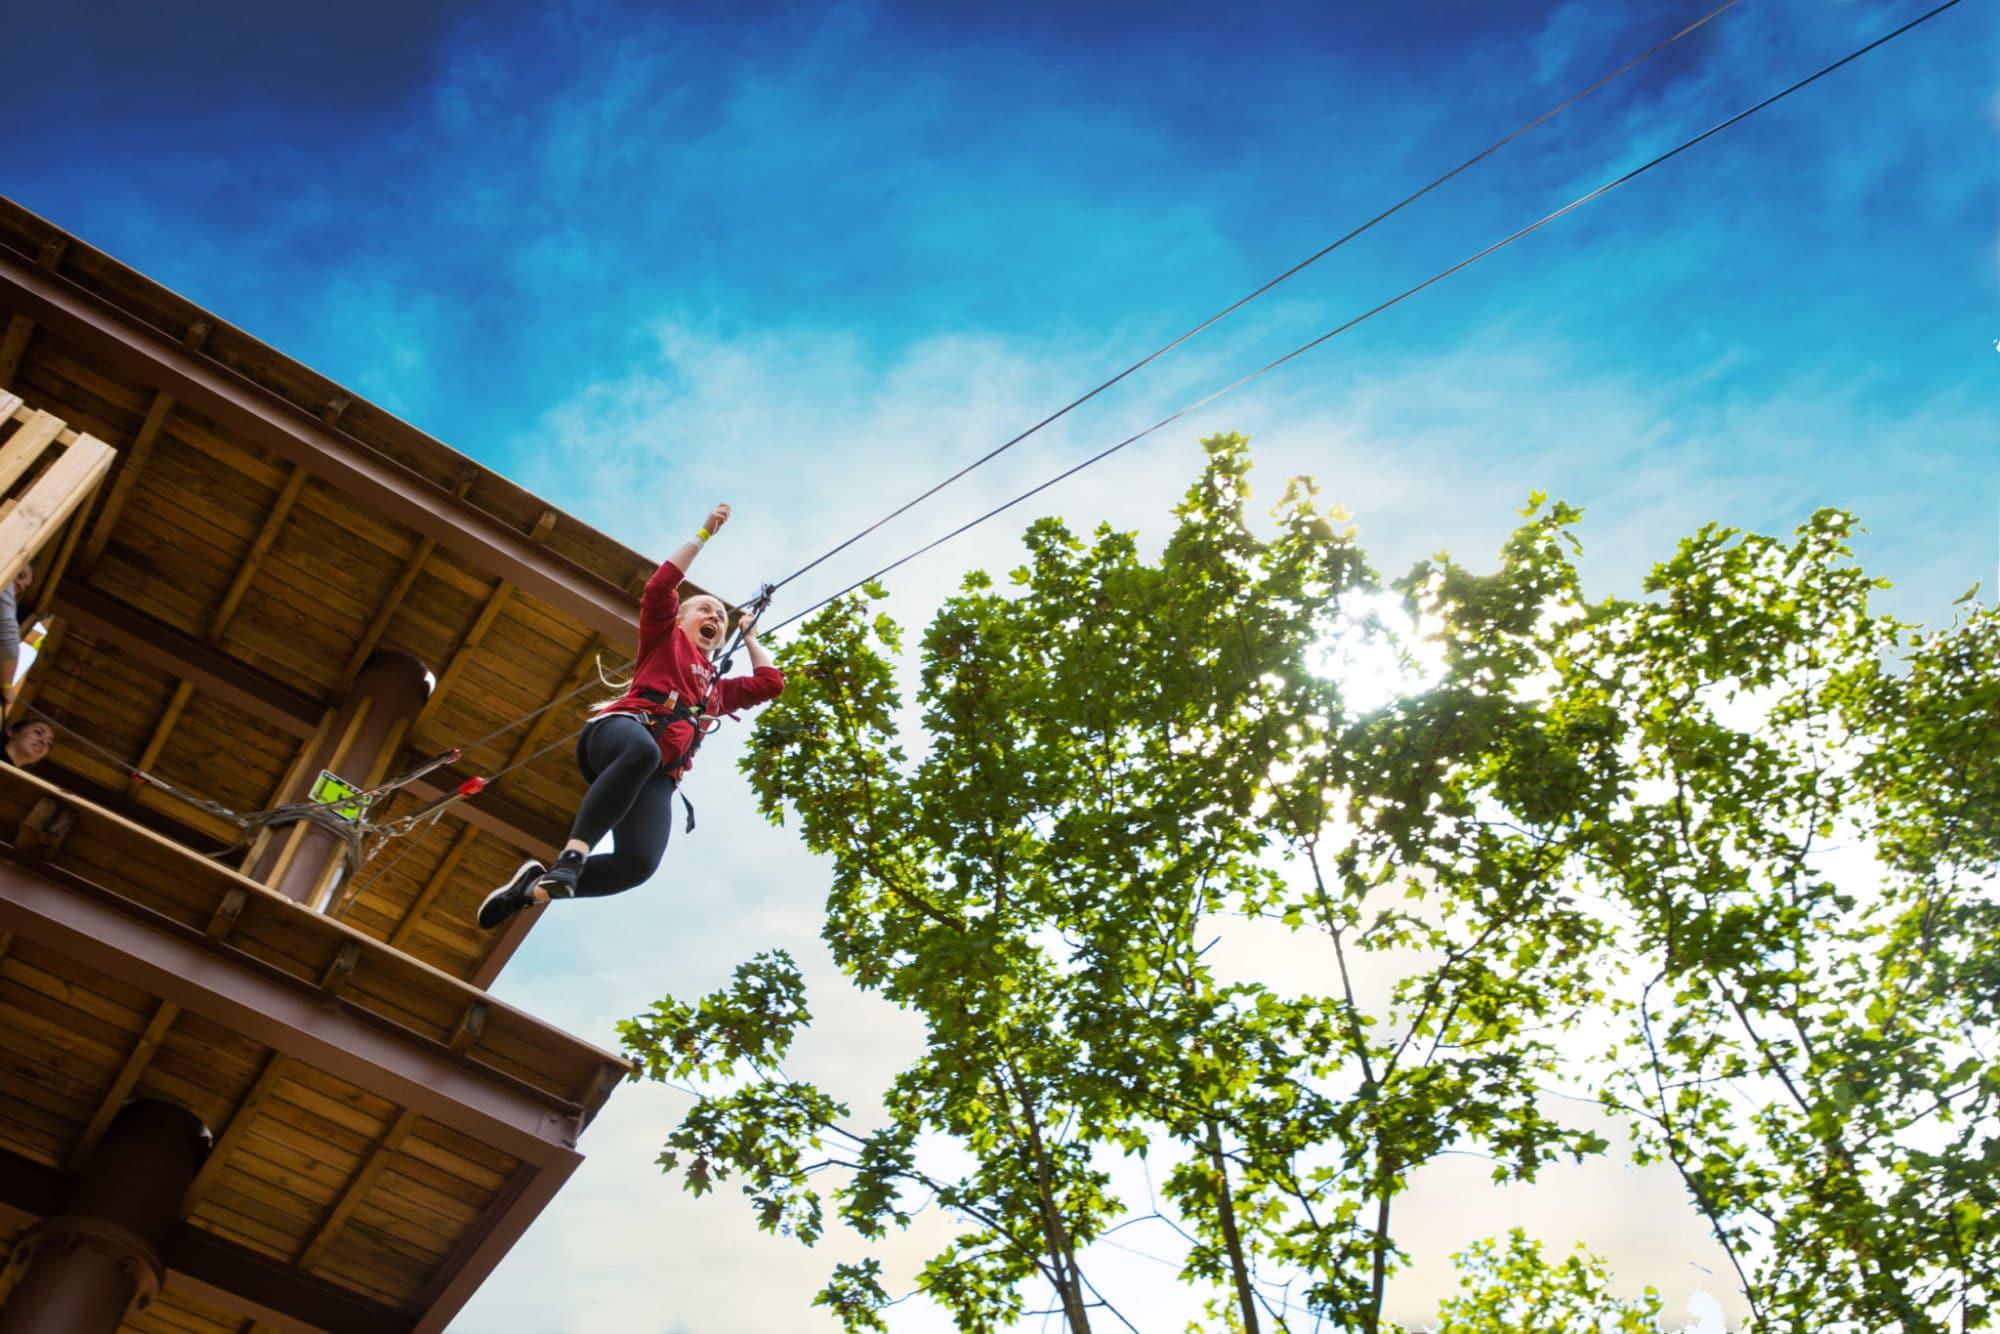 Go Ape Book Your Zipline Amp Treetop Adventure Experience